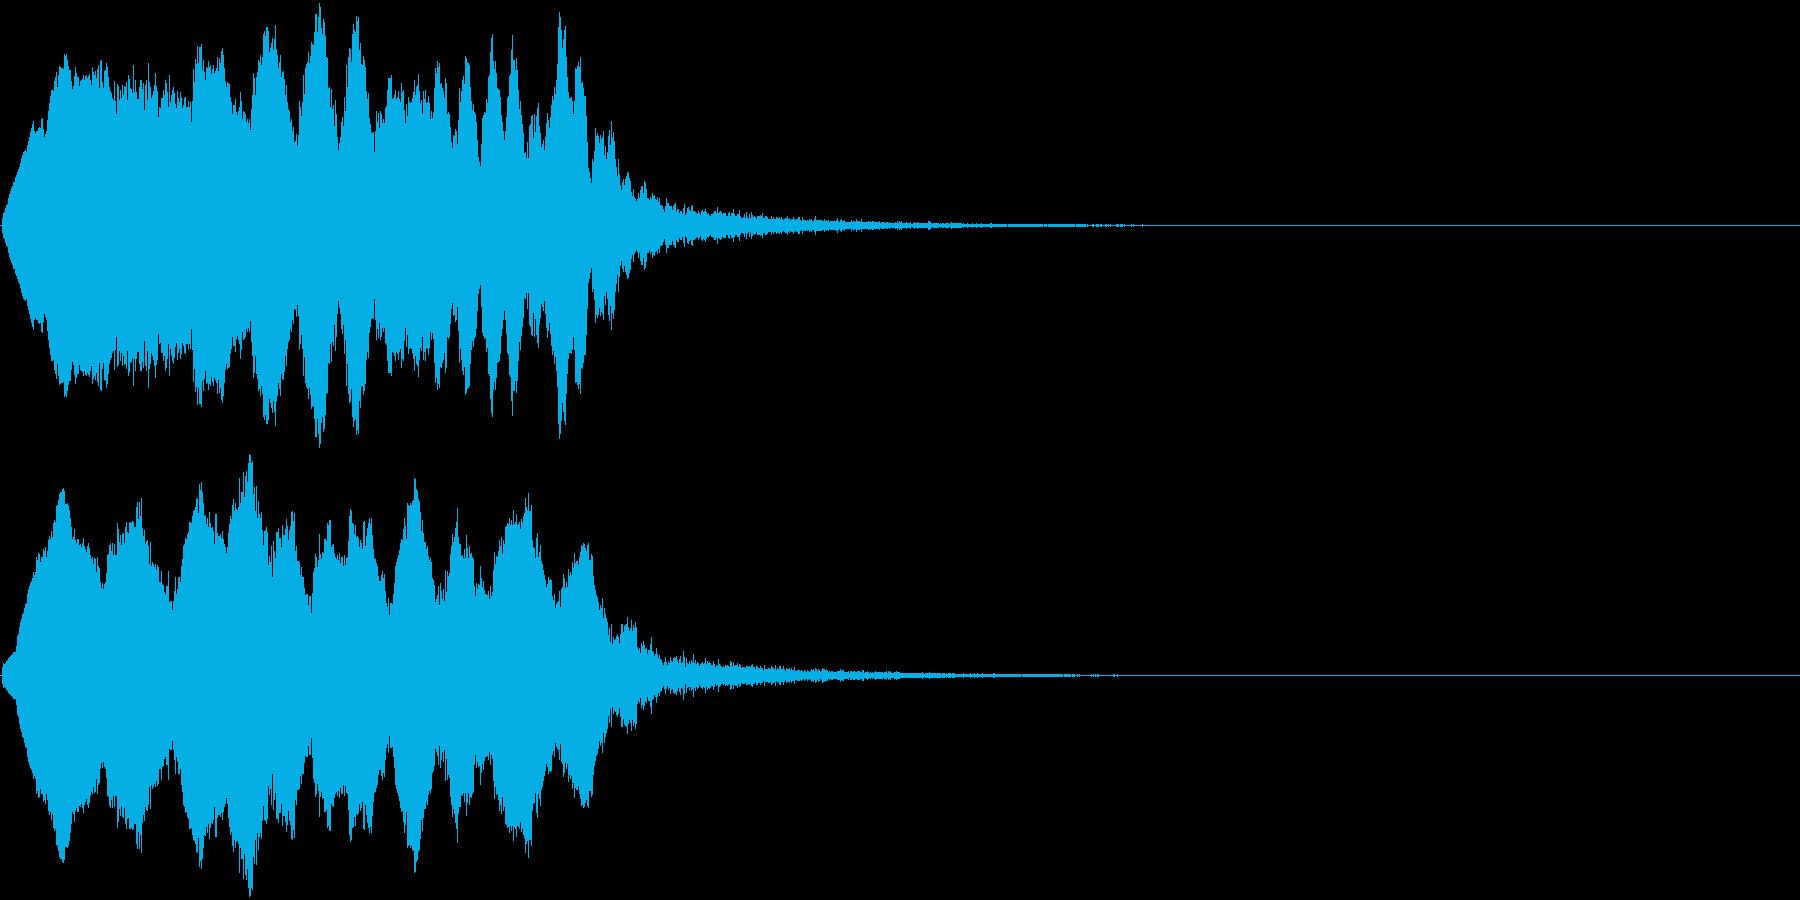 TVFX ポワーン クイズ出題前 上昇音の再生済みの波形